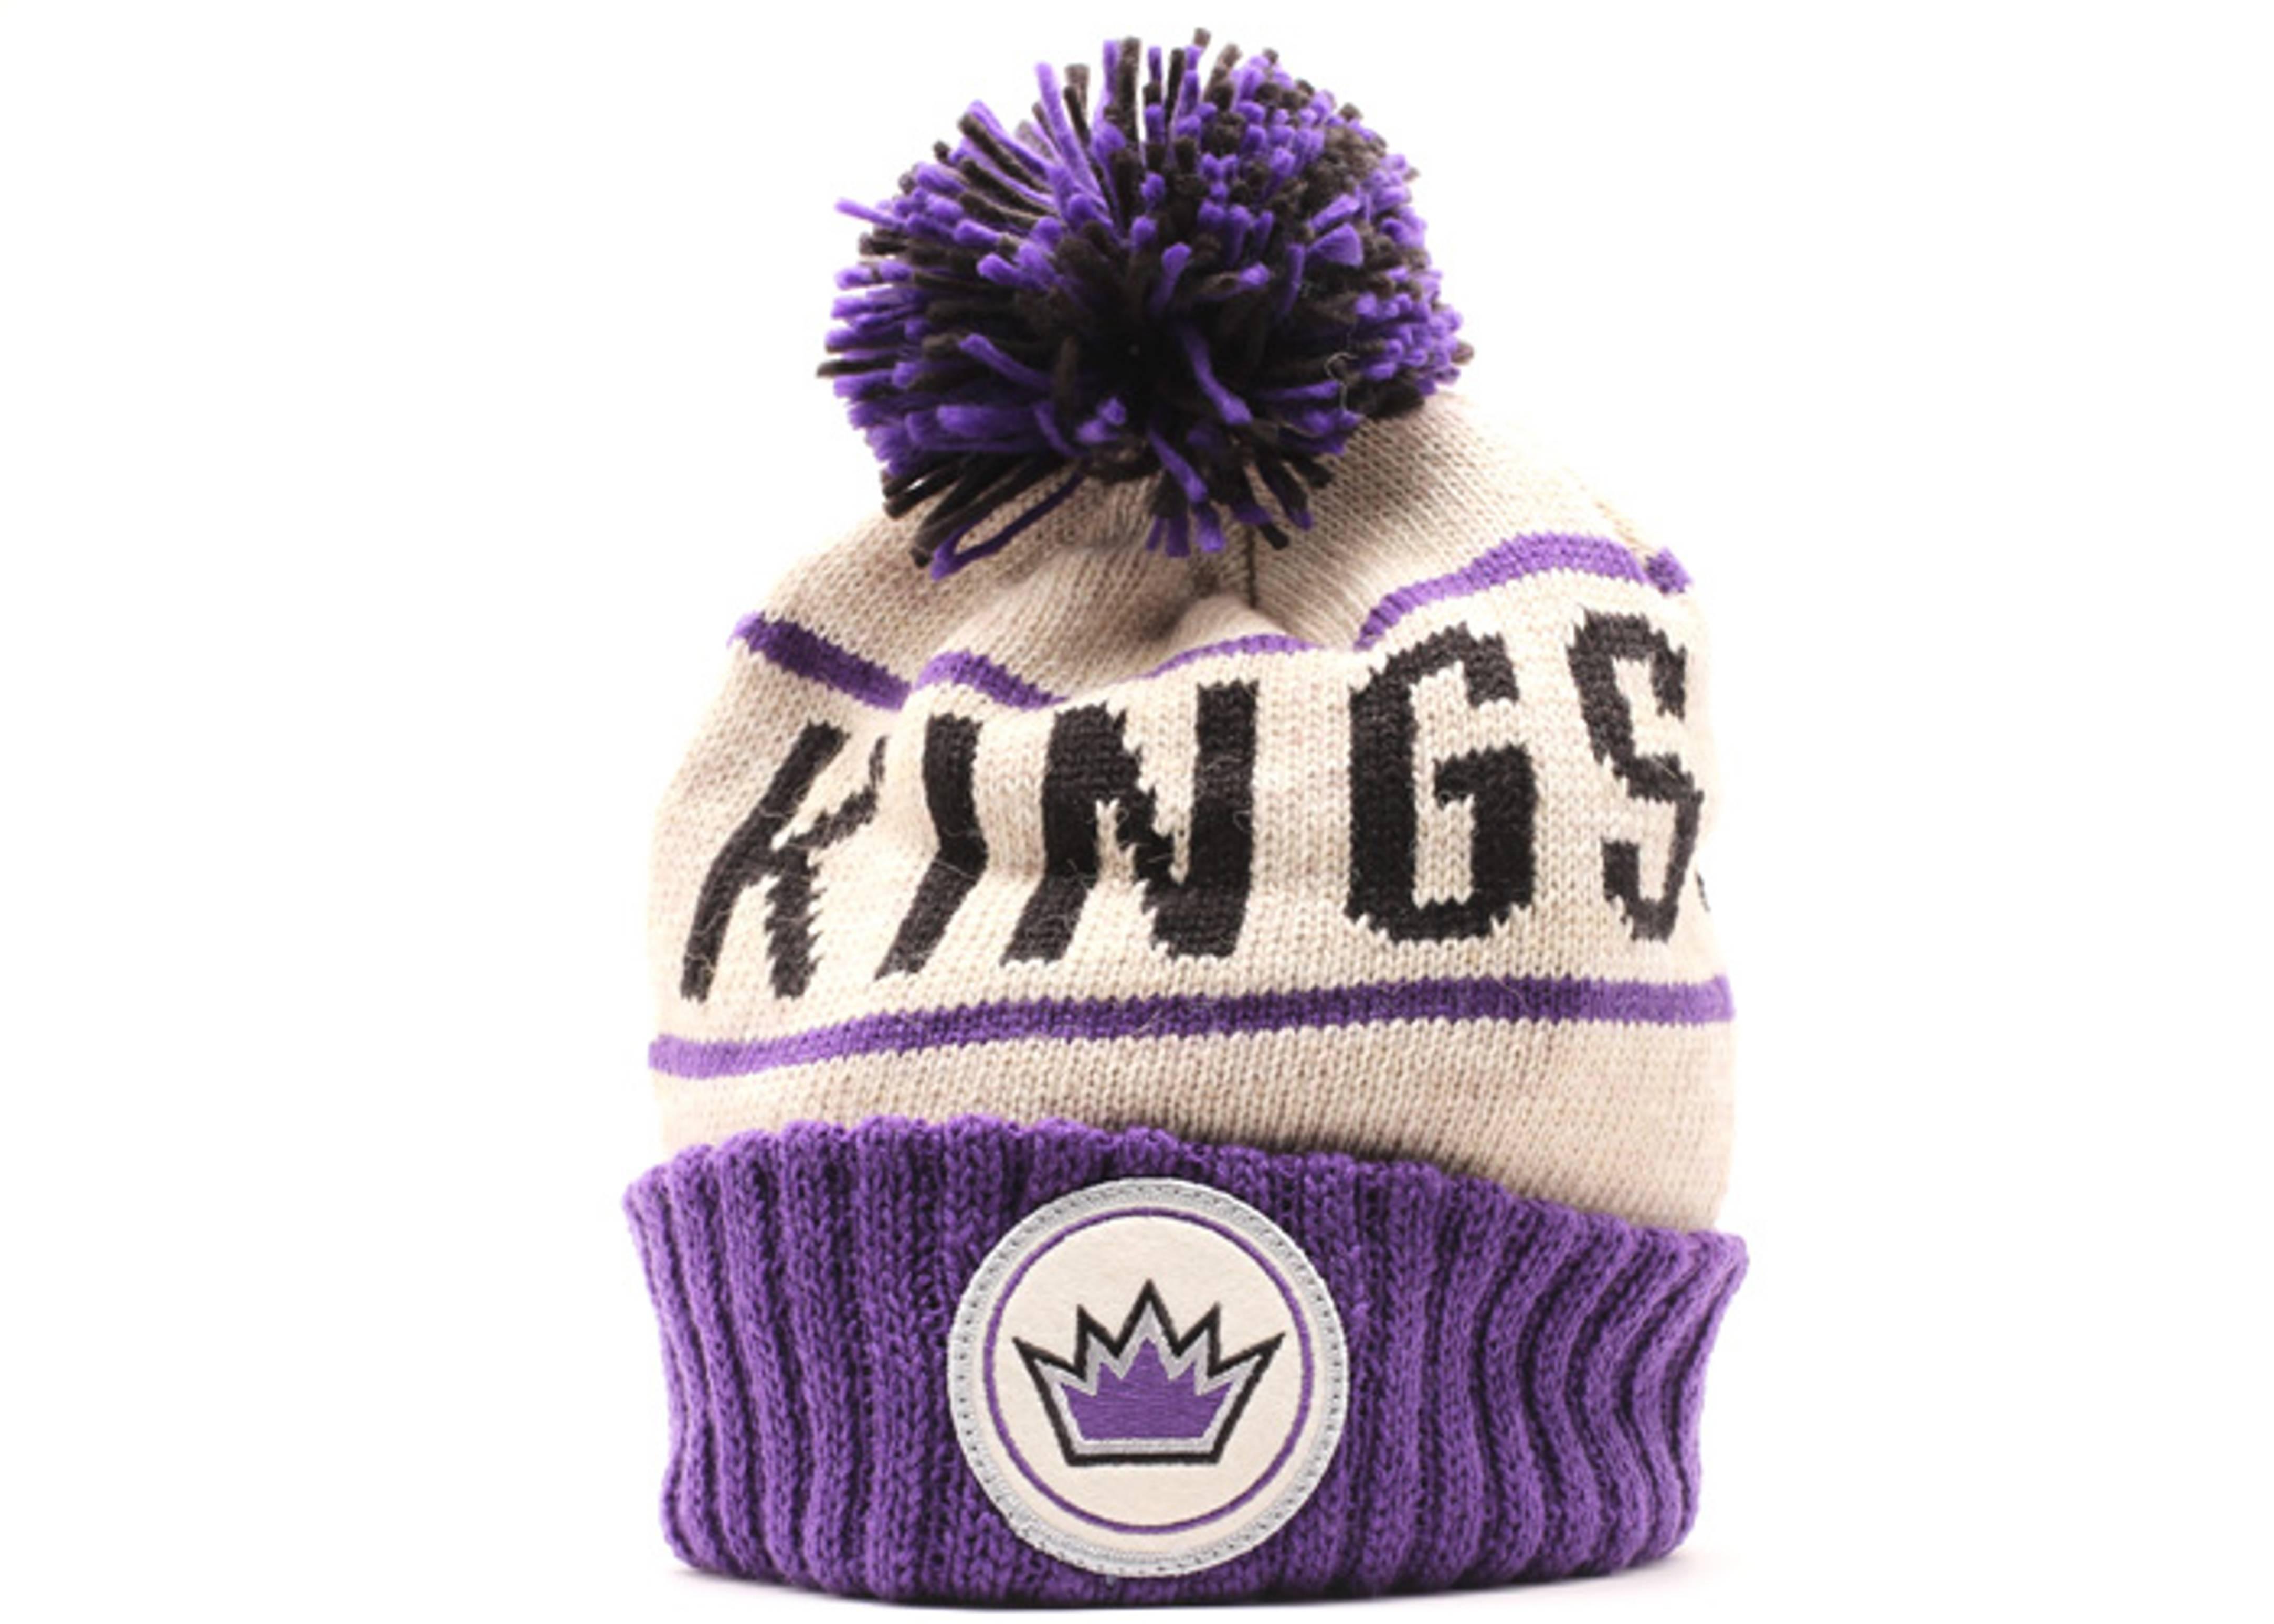 los angeles kings cuffed pom knit beanie